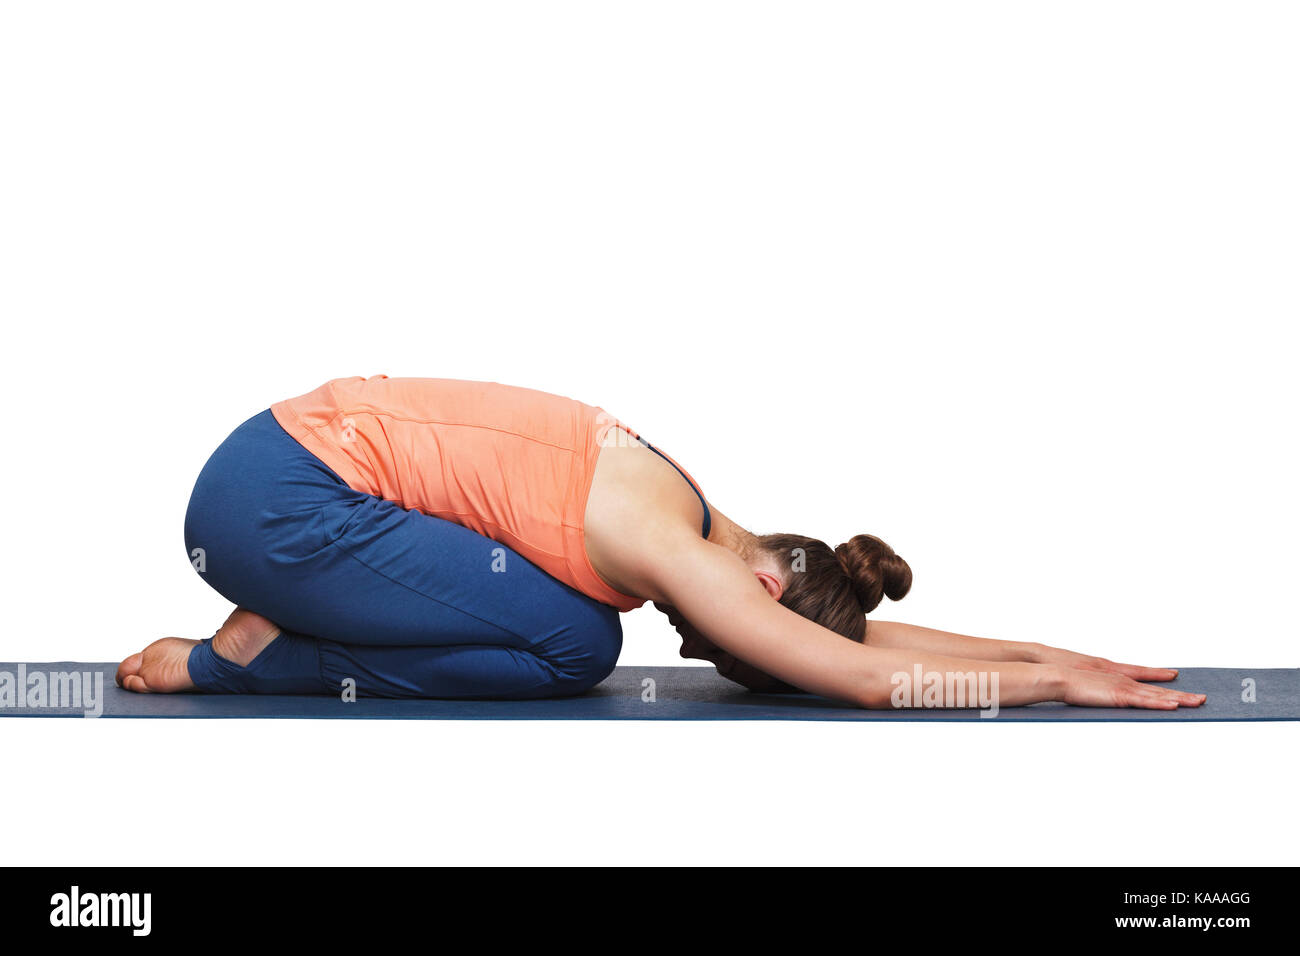 Woman relax in Hatha yoga asana Balasana child pose - Stock Image